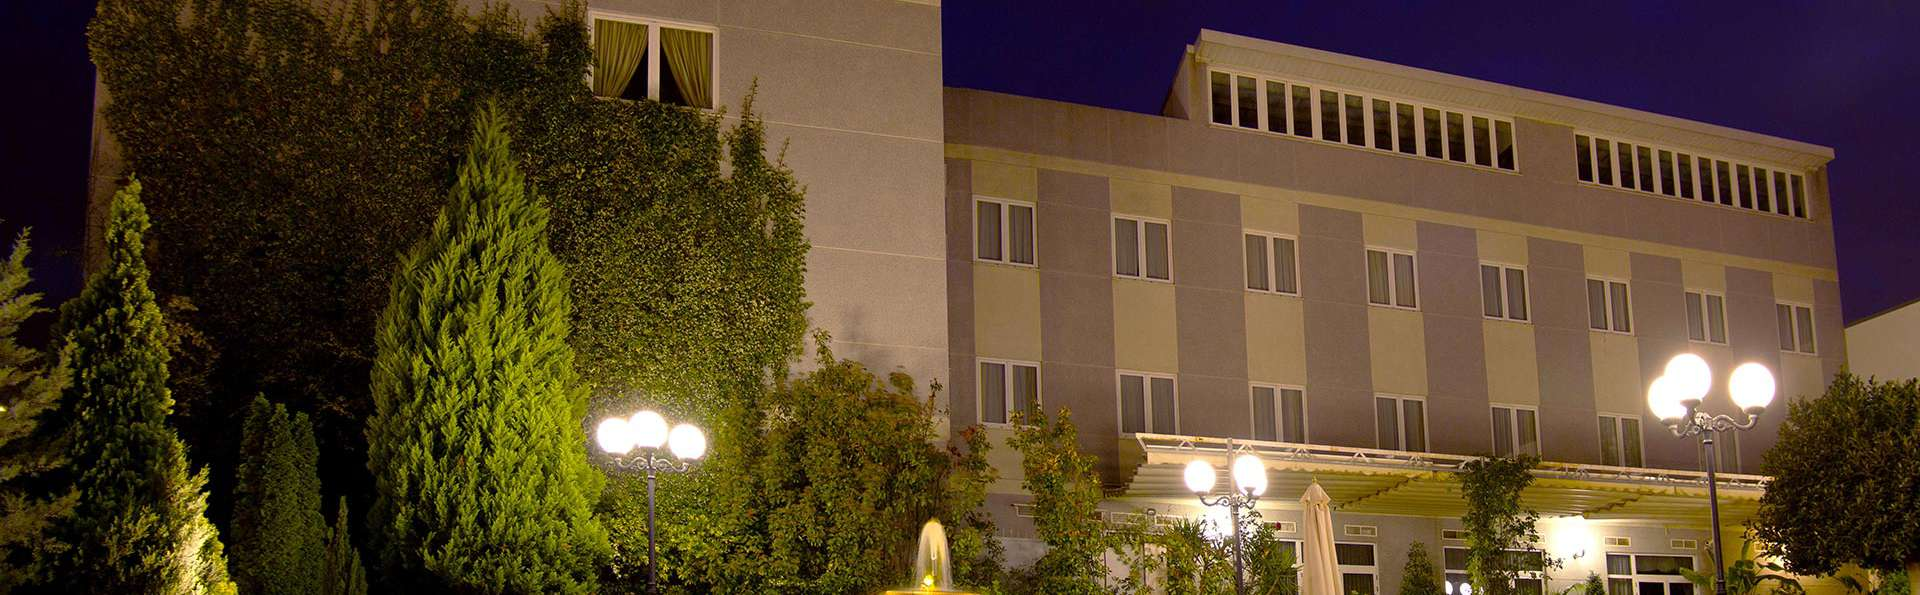 Sercotel Hotel Ciscar - edit_facade2.jpg